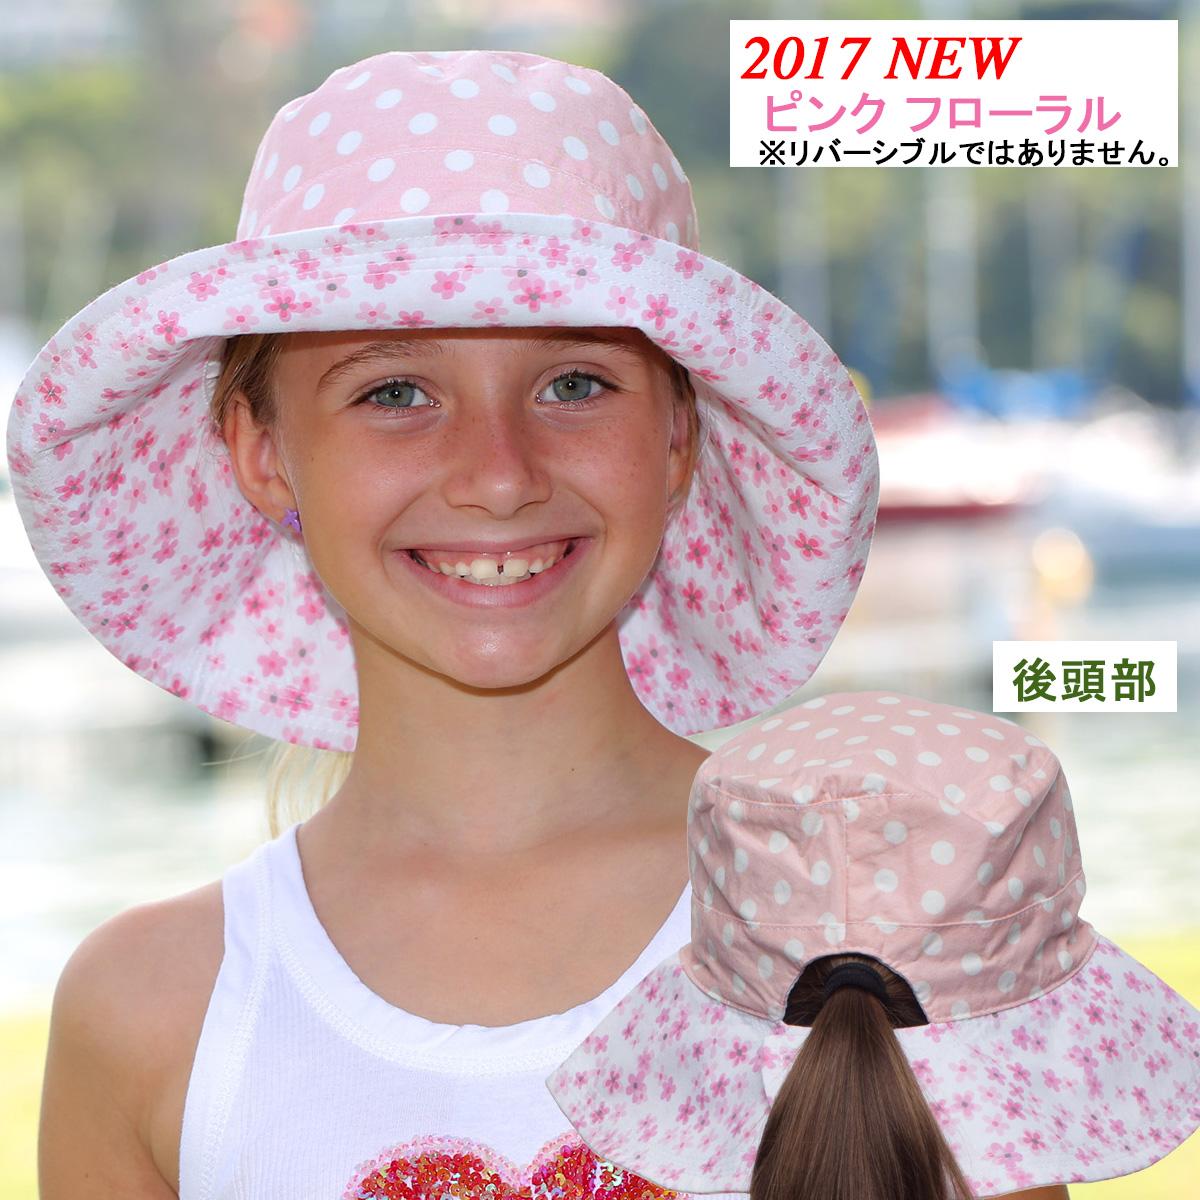 UV 切的帽子儿童)-孩子孩子的帽子-可逆的马尾辫帽子的孩子孩子们女士们 * 紫外线 (UV) 最大值为边境巡逻队 50 +